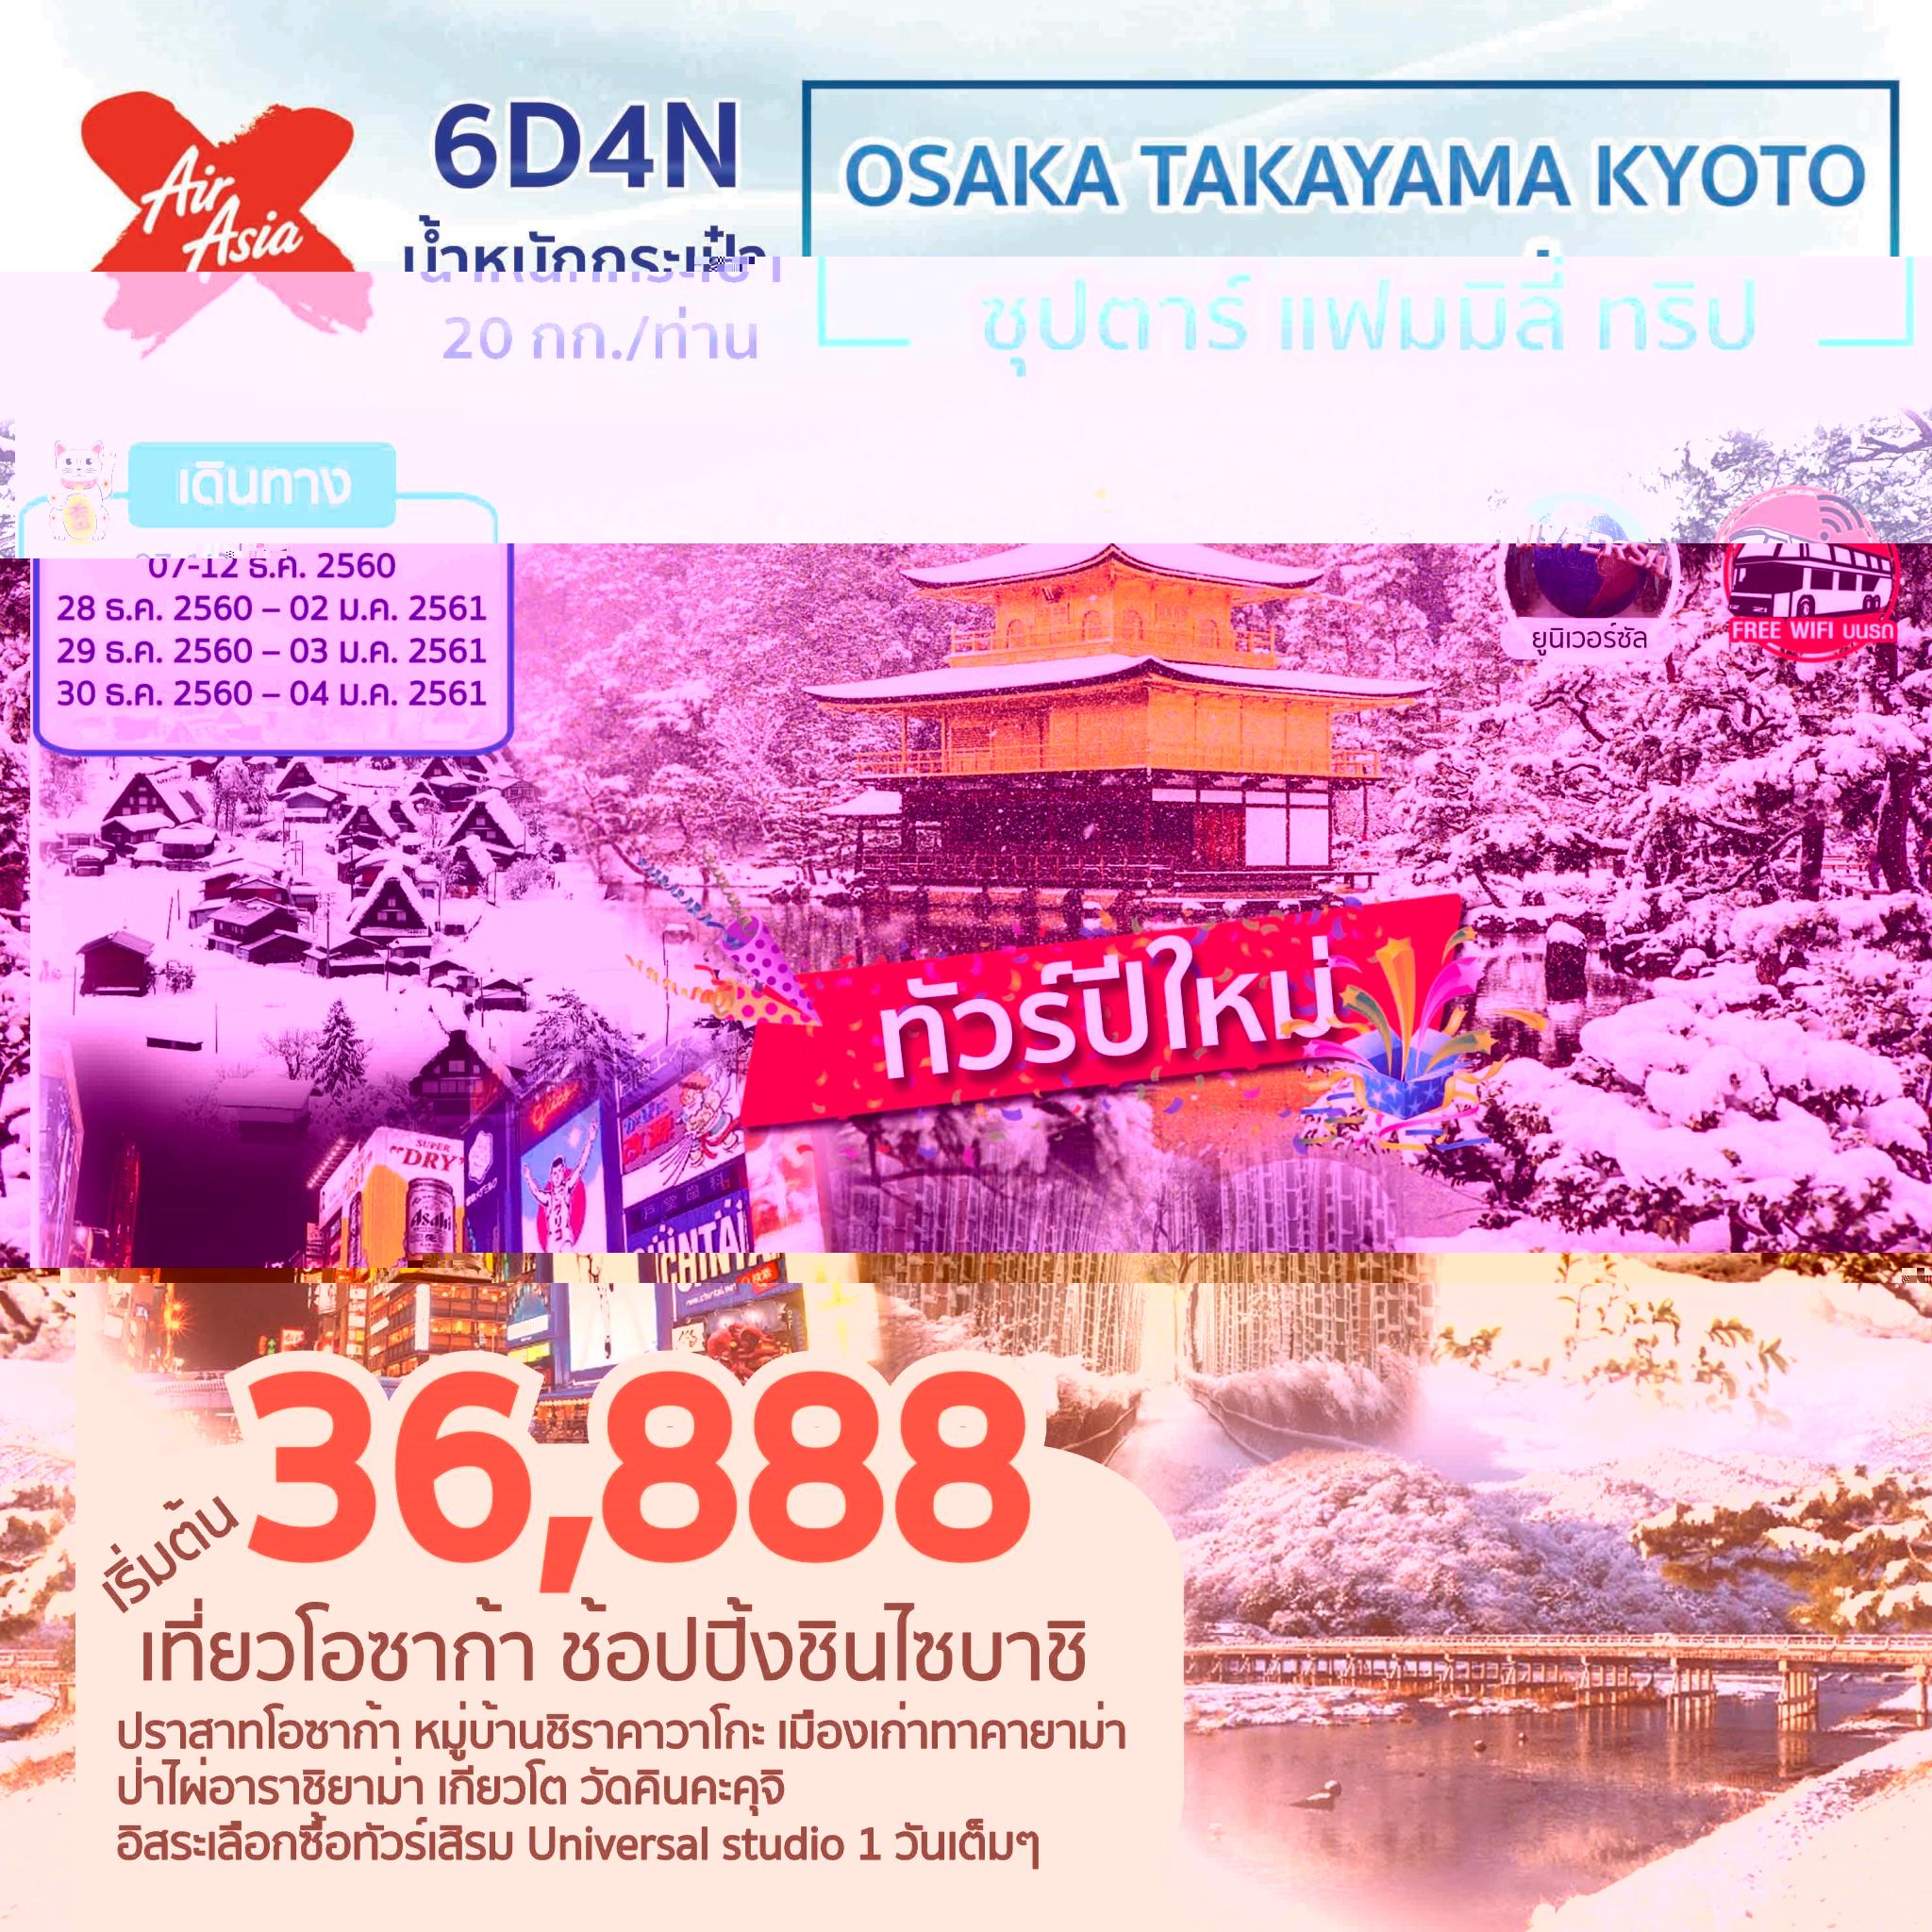 OSAKA TAKAYAMA KYOTO 6D 4N